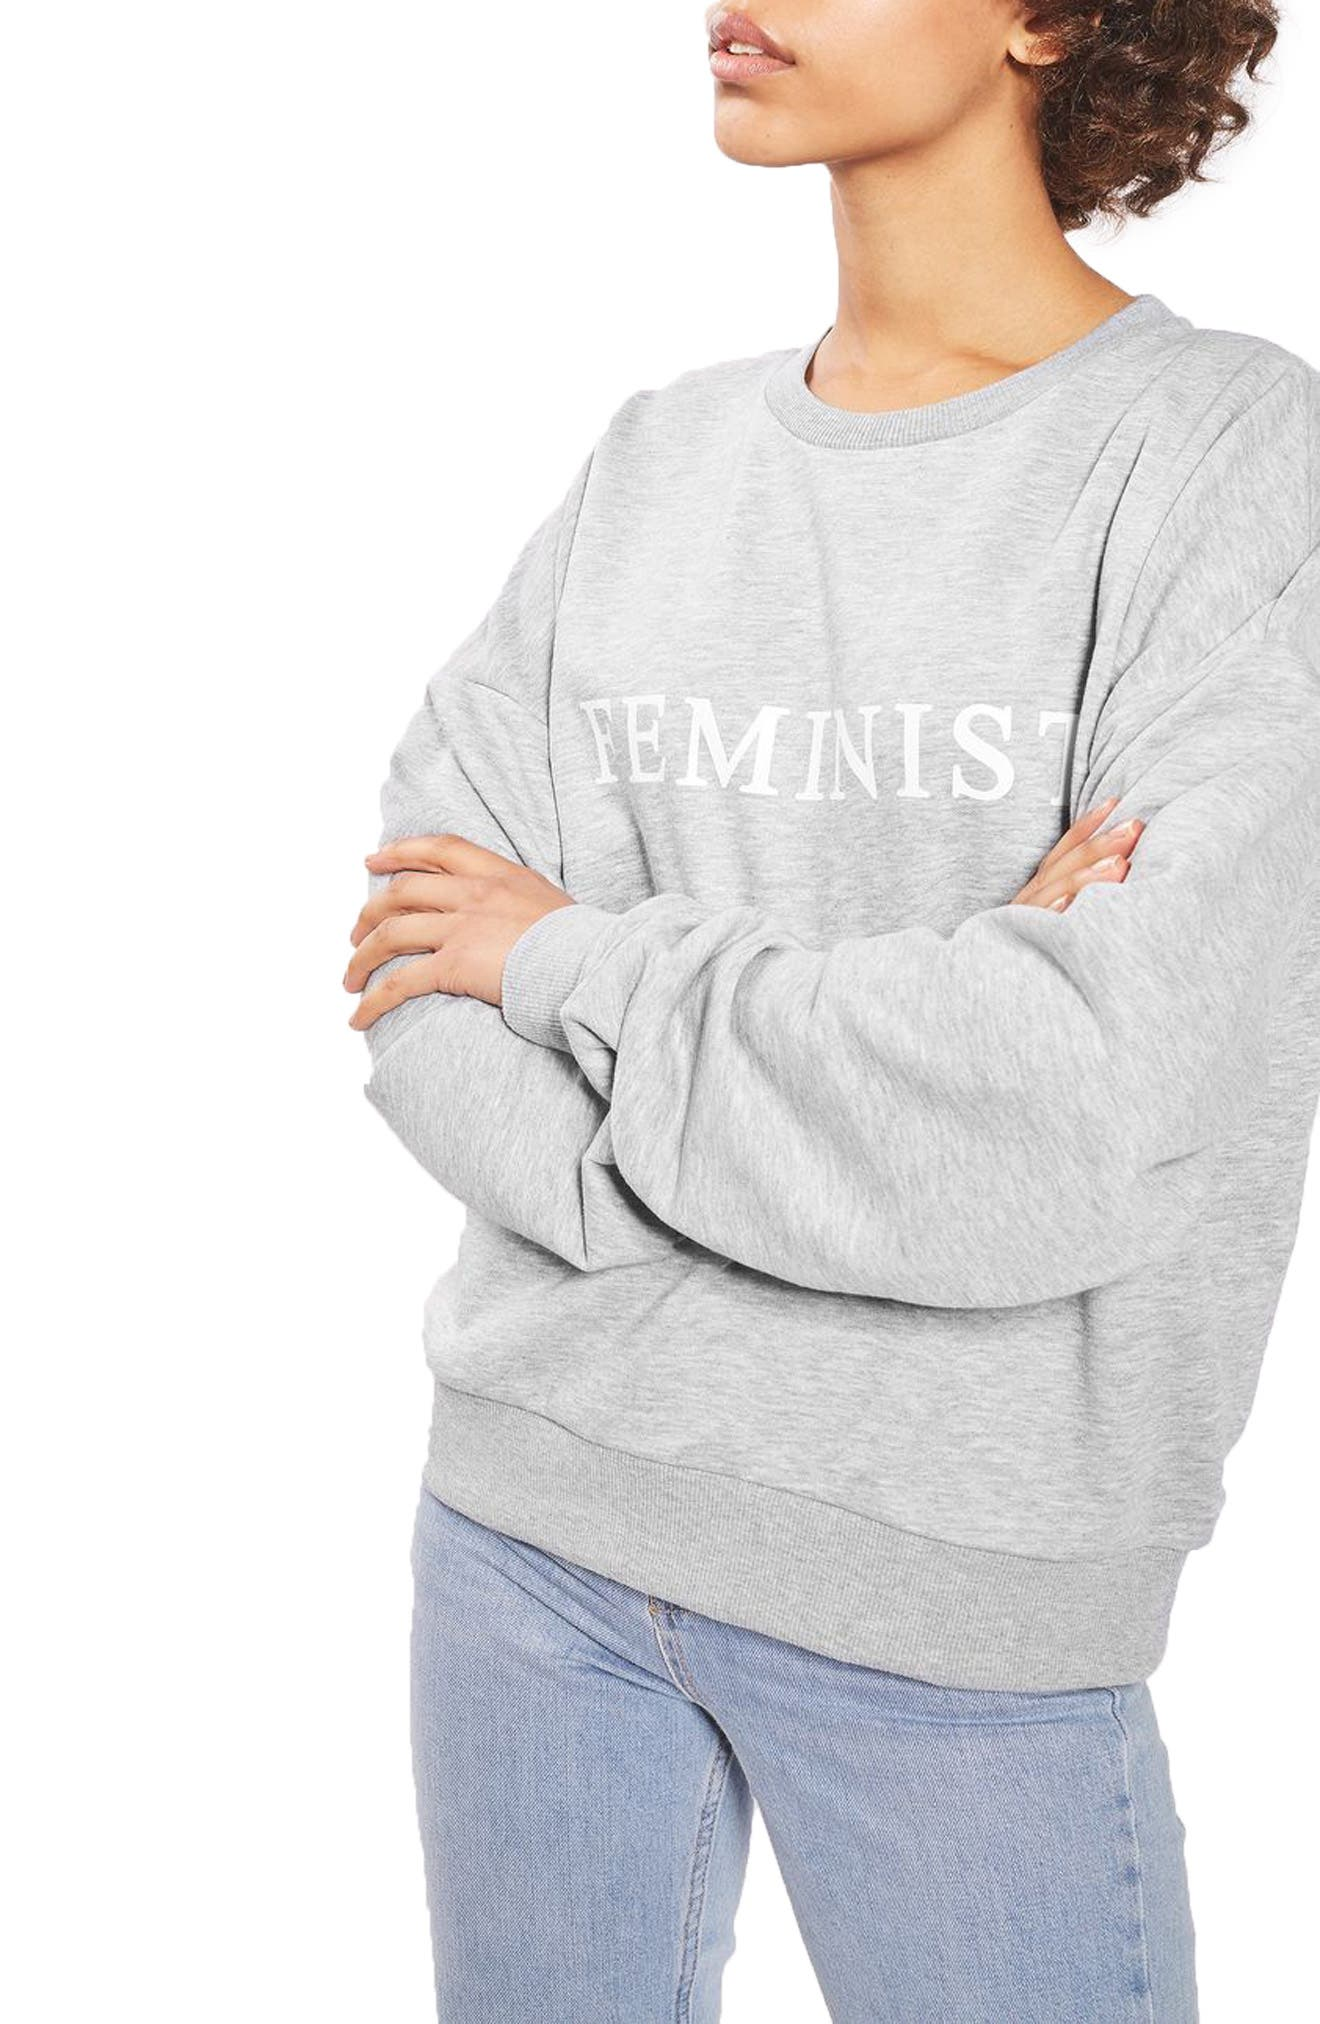 TOPSHOP,                             Feminist Sweatshirt,                             Main thumbnail 1, color,                             020